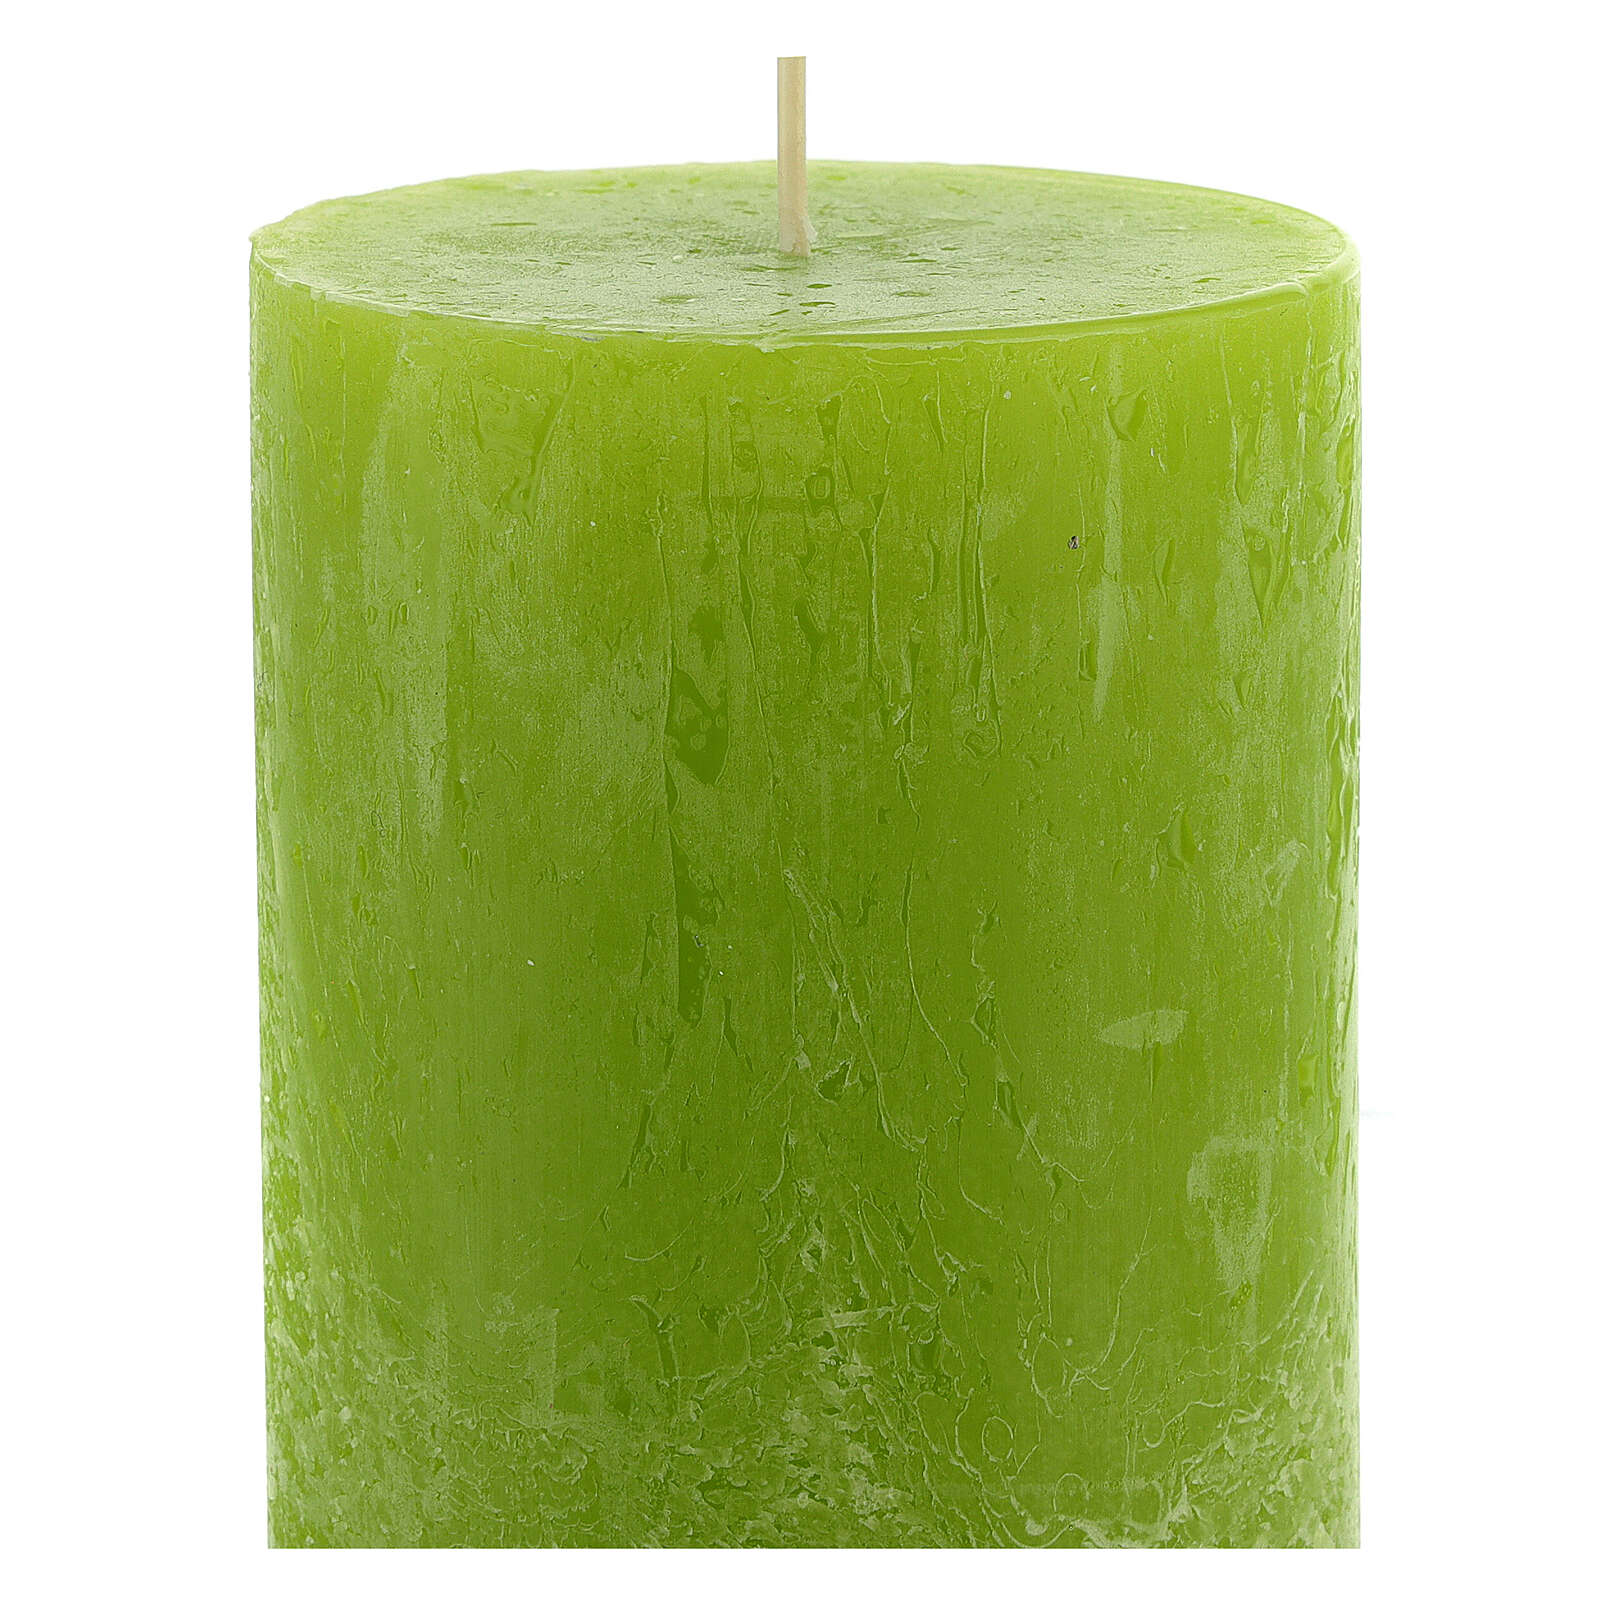 Kerzen rustikaler Stil 12 Stück grün, 140x80 mm 3